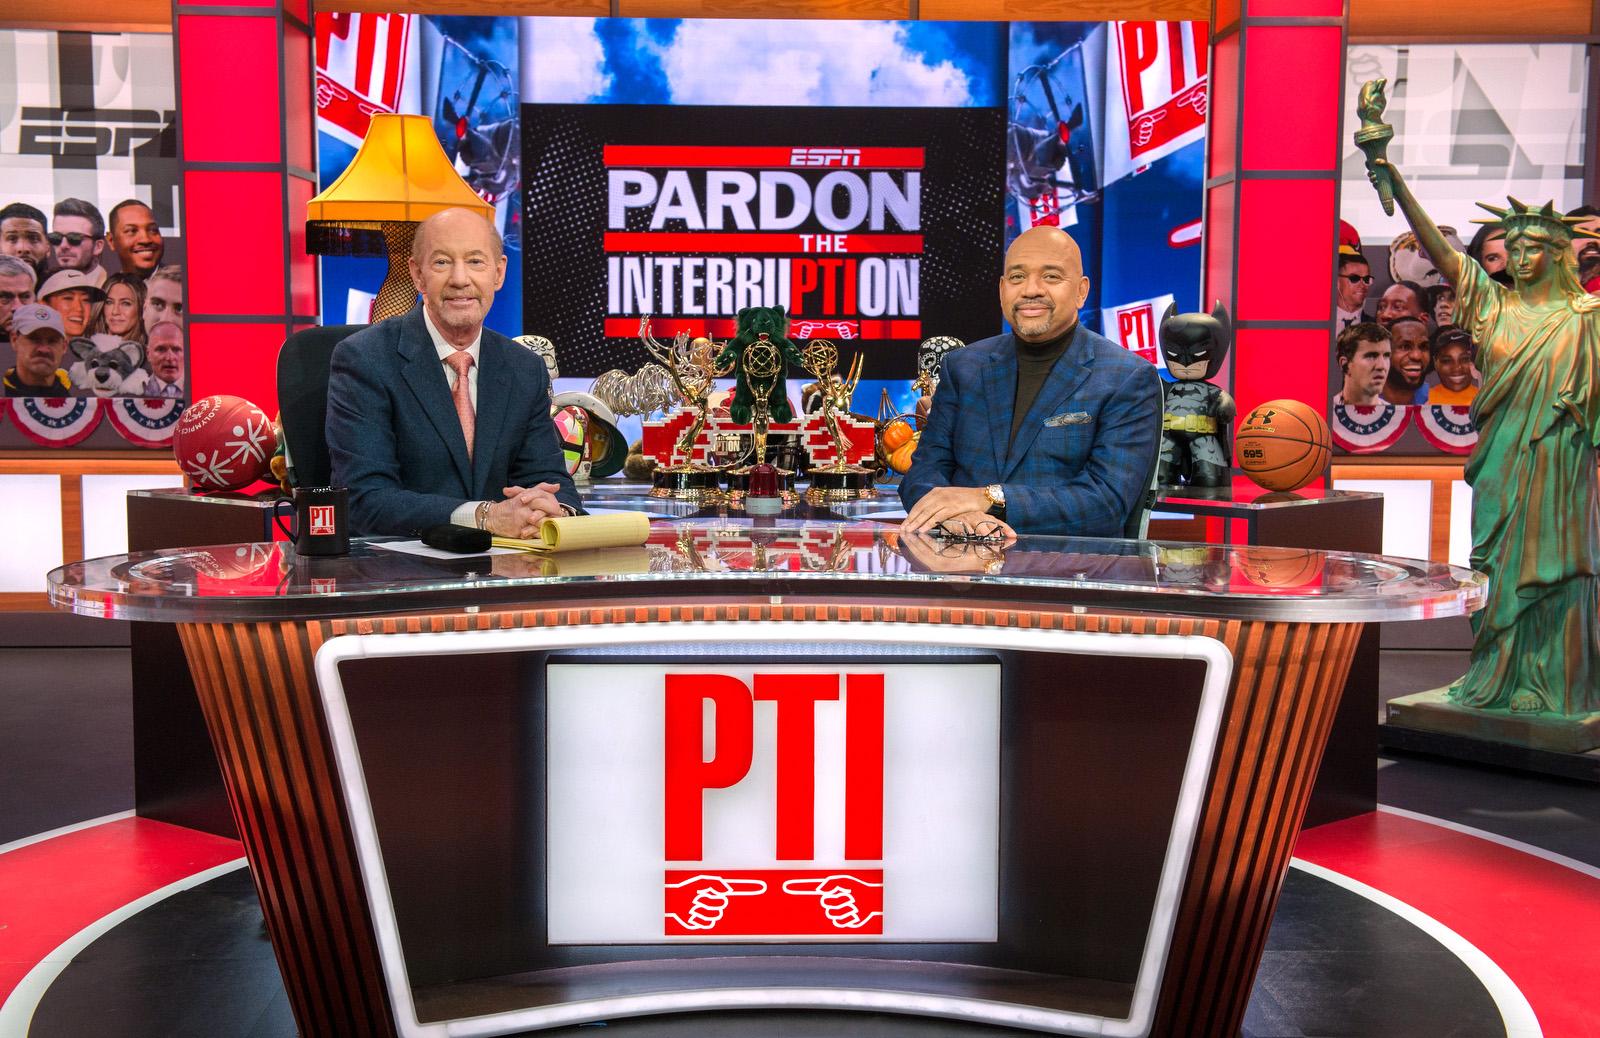 Washington D.C. - January 14, 2020 - DC Studios: Tony Kornheiser and Michael Wilbon on the Pardon the Interruption set. (Photo by Randy Sager / ESPN Images)